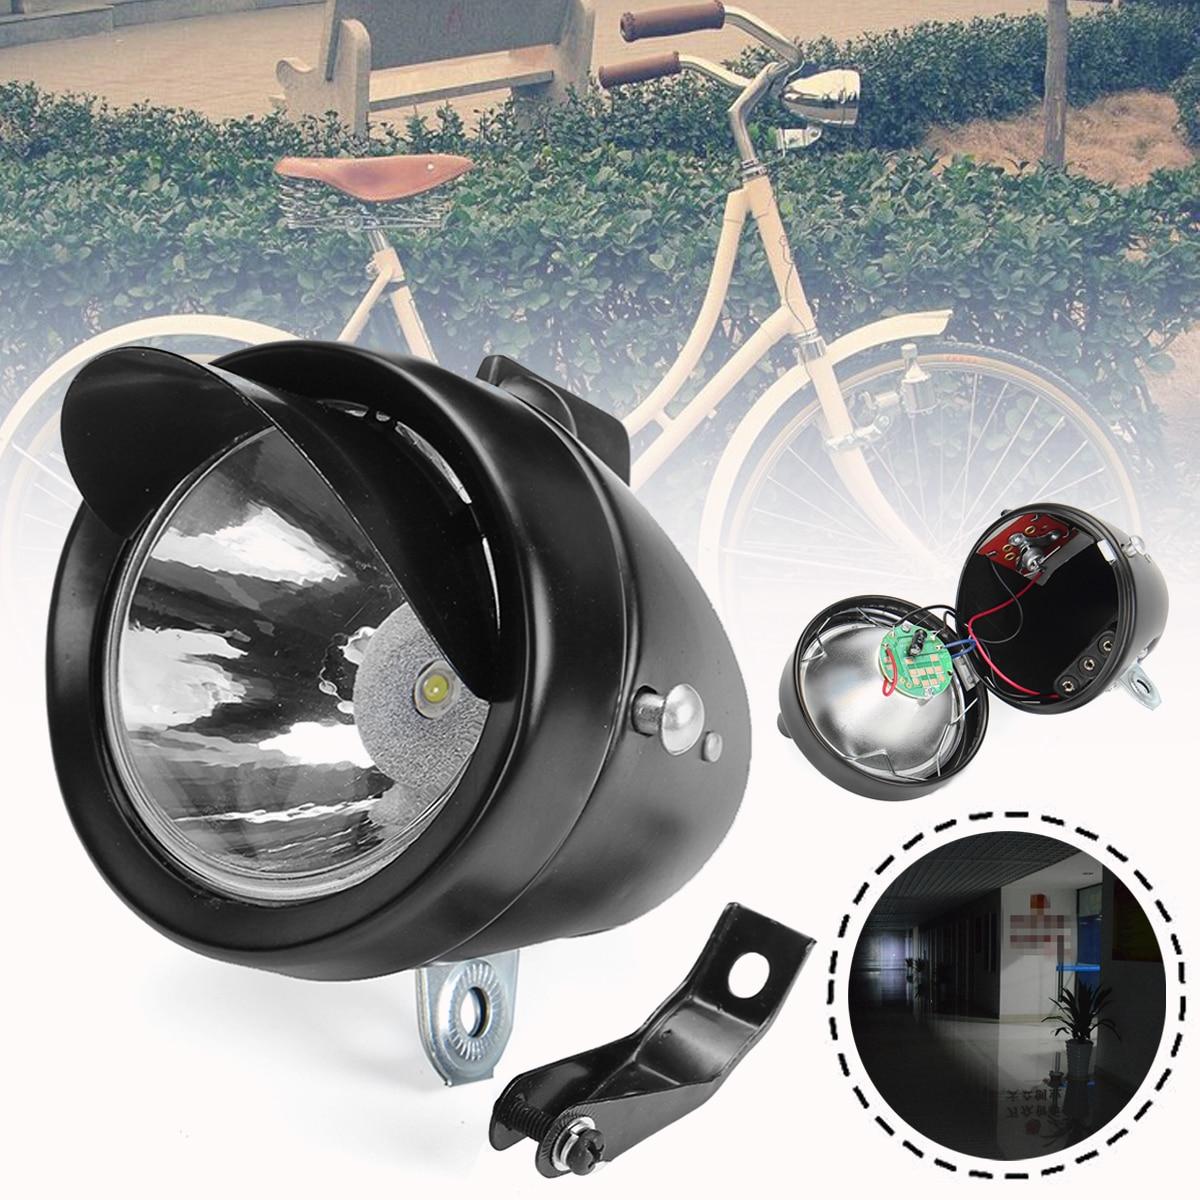 Retro Bicycle Bike LED Front Light Headlight Vintage Flashlight Lamp 3 AAA